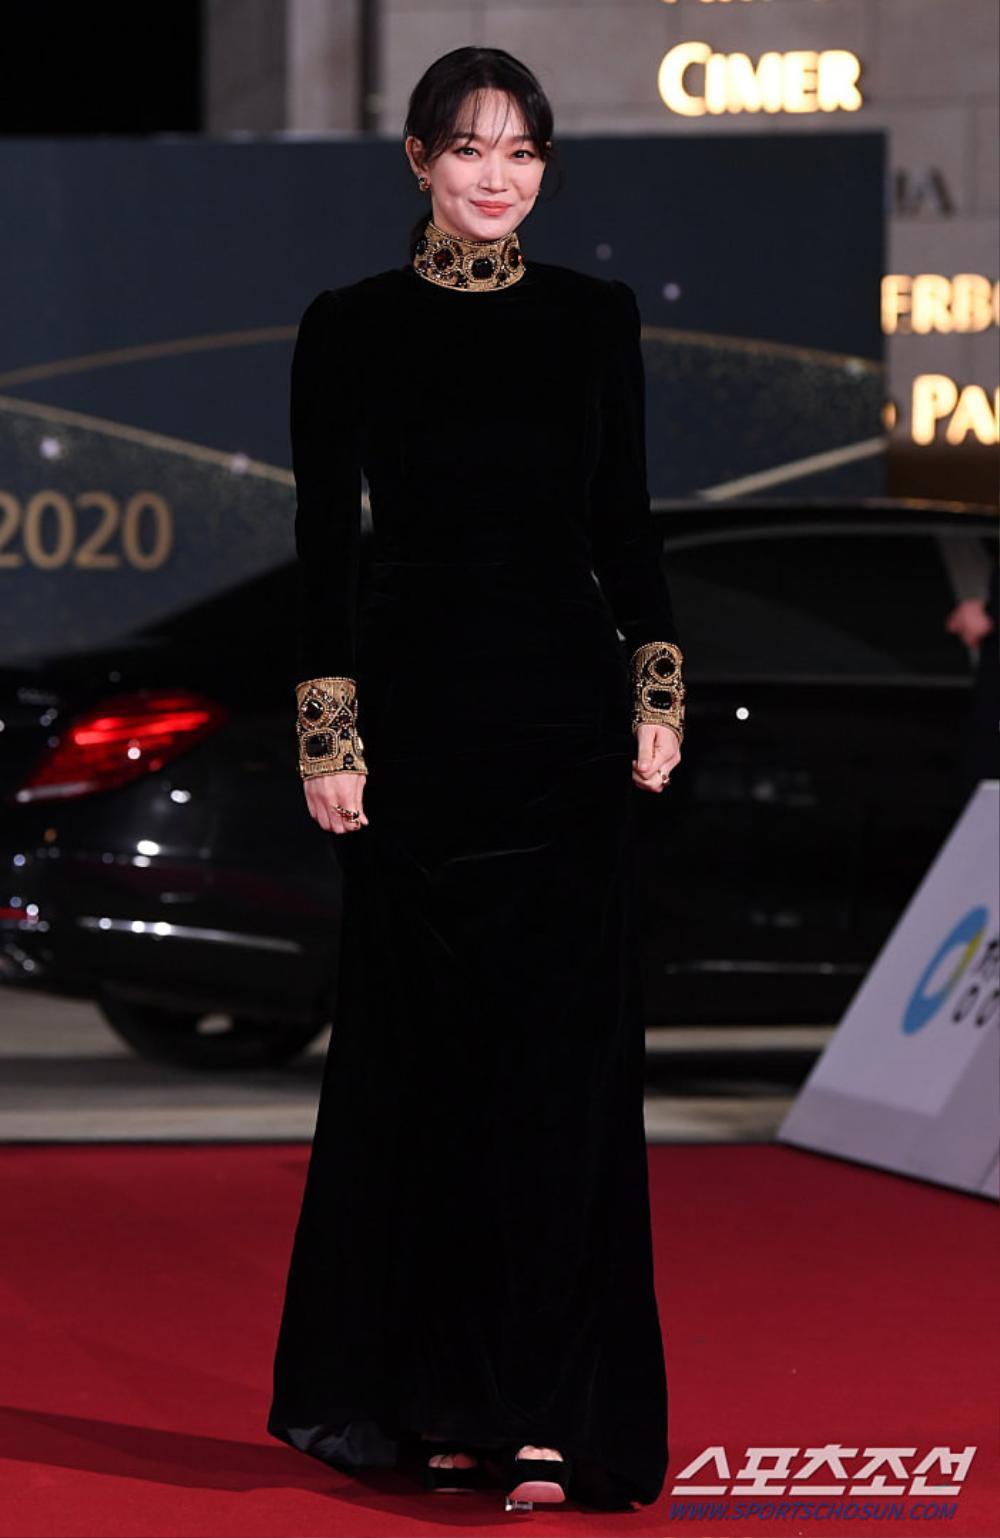 Thảm đỏ 'Rồng xanh 2020': Shin Hye Sun 'cân sắc' Shin Min Ah, Jung Woo Sung - Lee Byung Hun điển trai! Ảnh 20